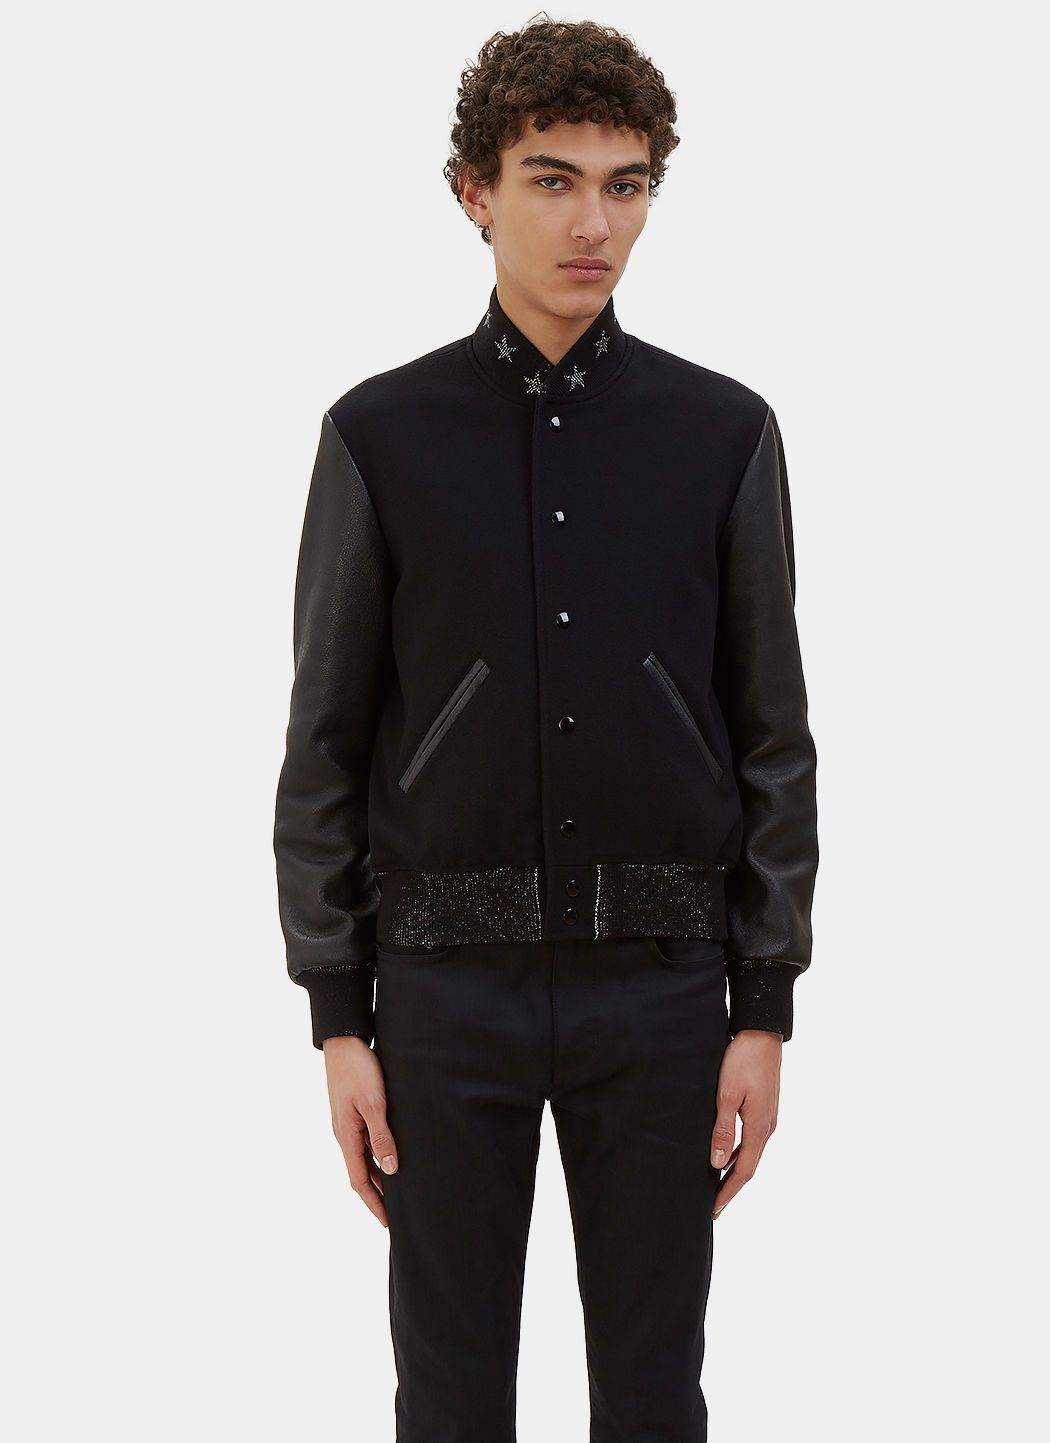 1ab22f1ef59 SAINT LAURENT Men's Star Collared Teddy Bomber Jacket in Black. # saintlaurent #cloth #